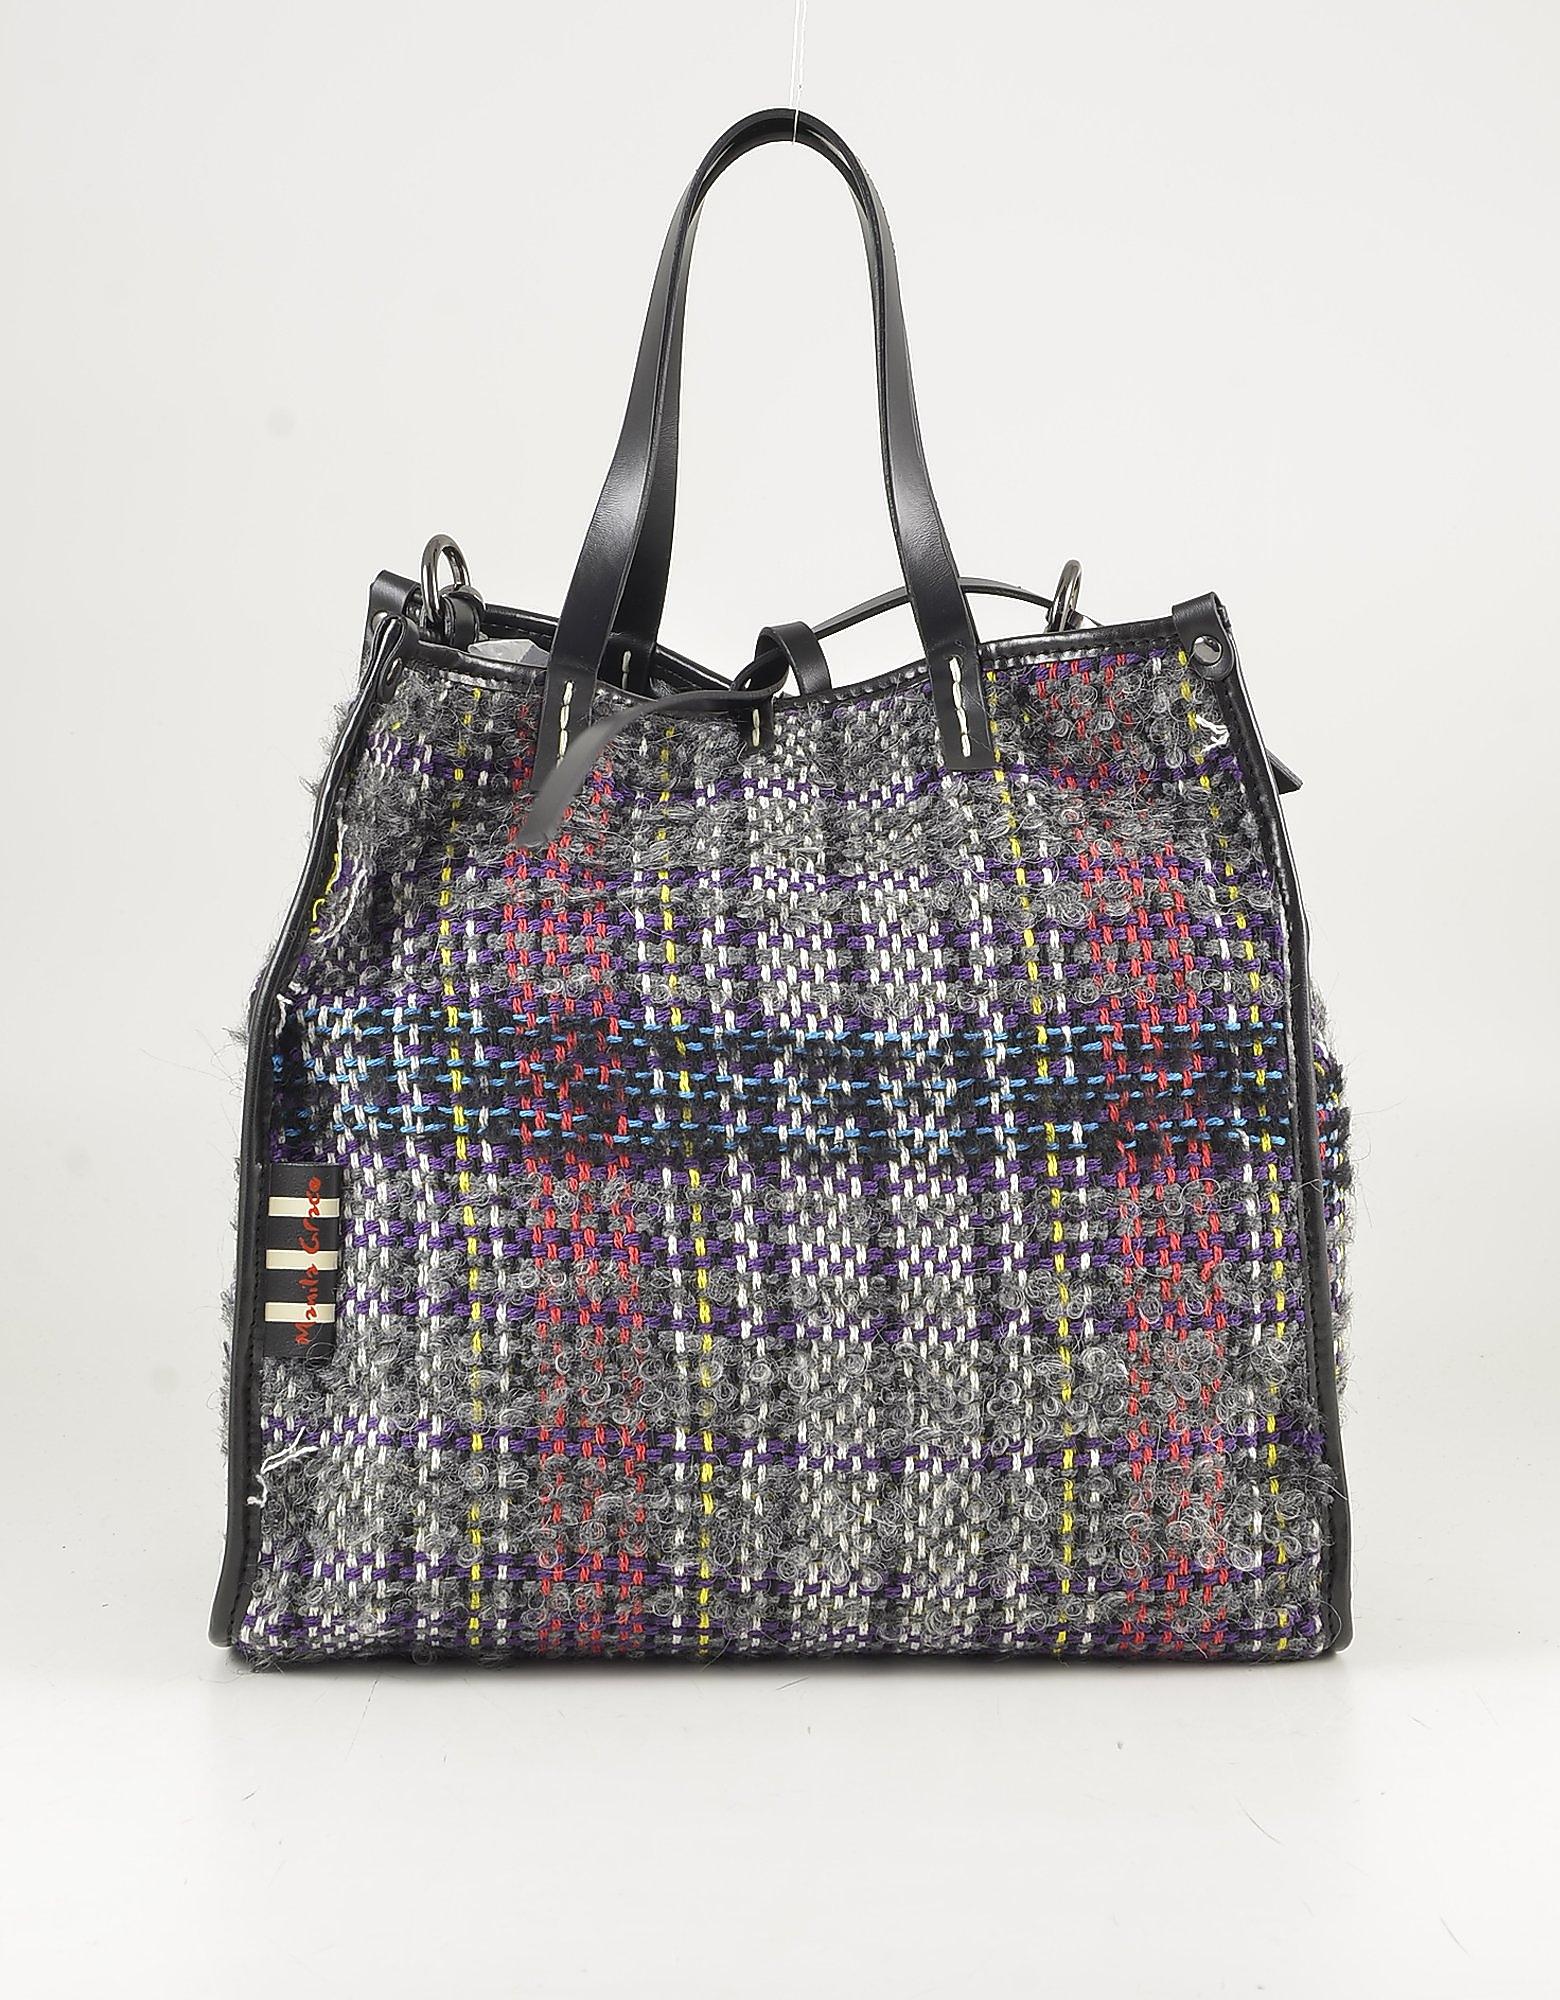 Manila Grace Black Tweed & Eco-leather Tote Bag